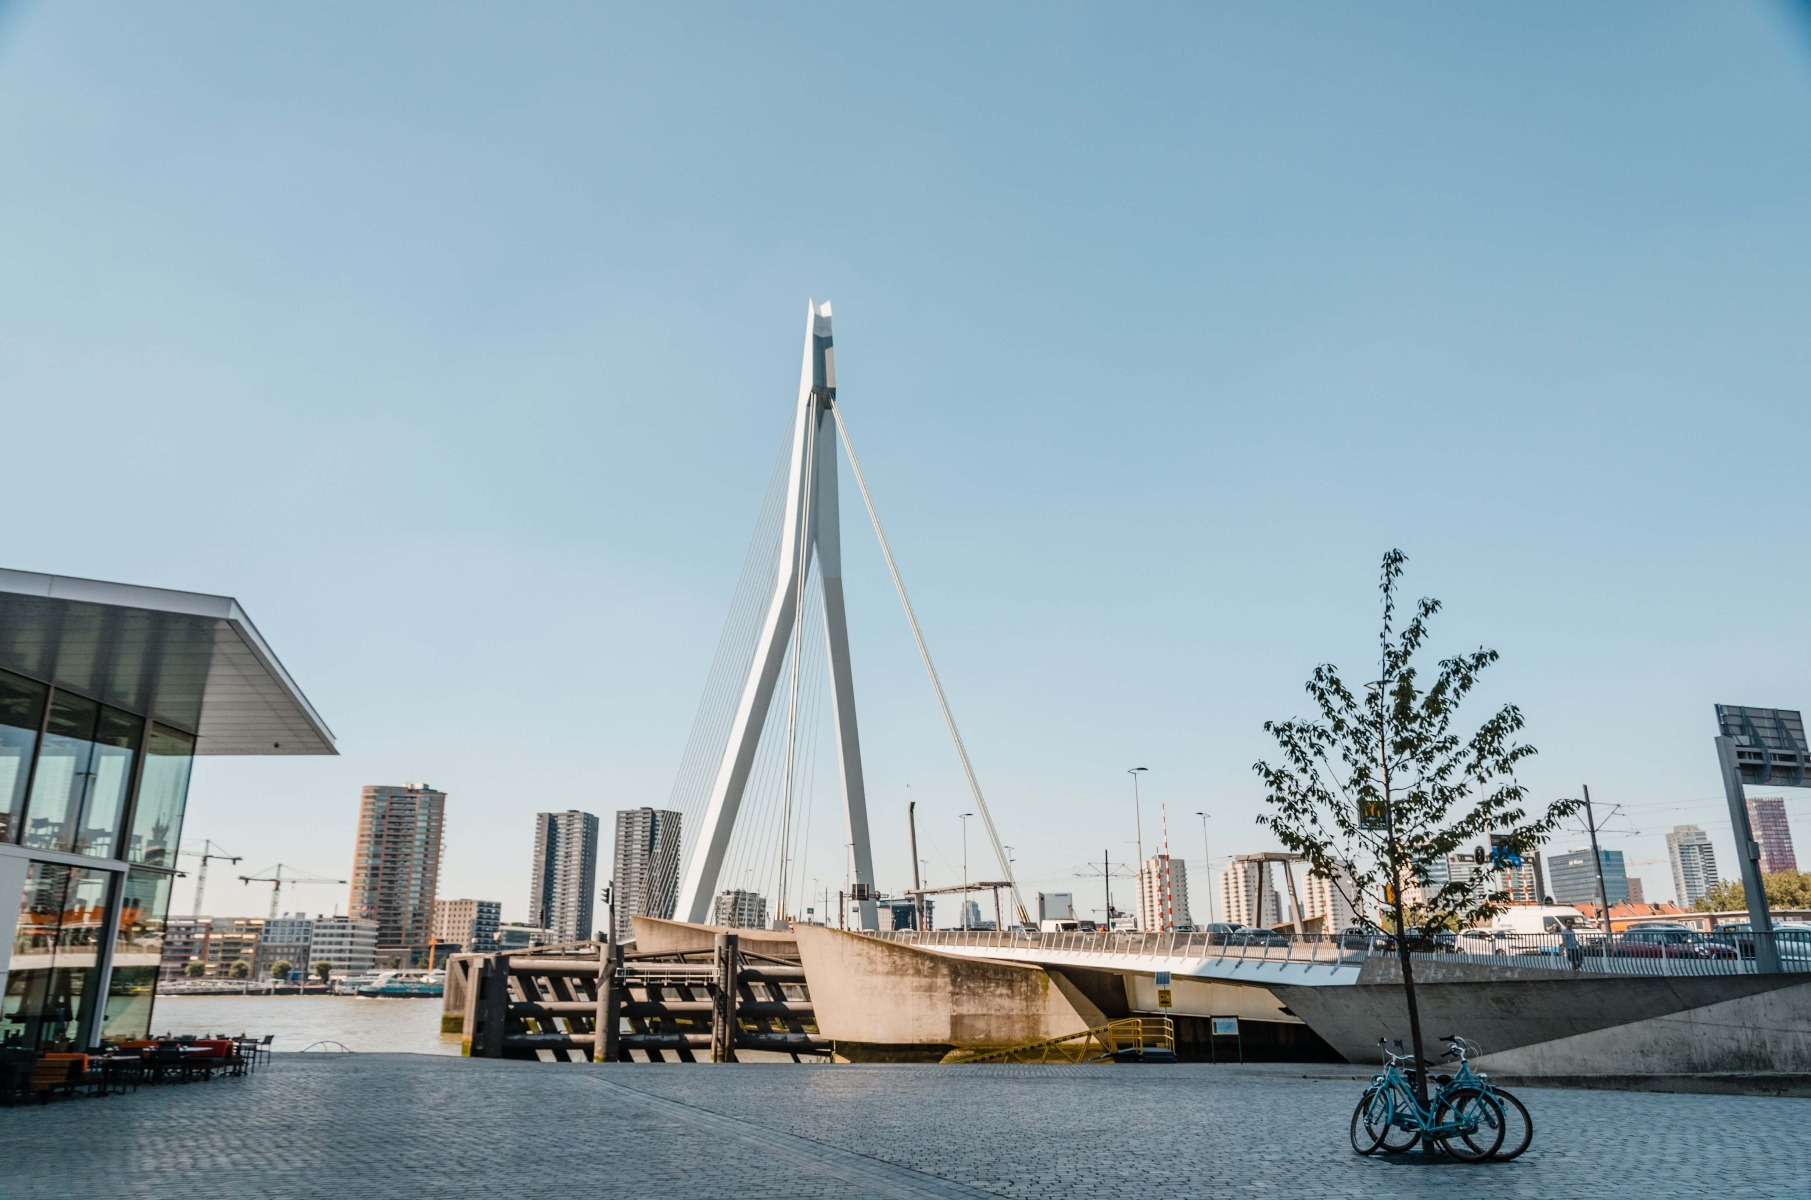 10x De leukste Rotterdamse souvenirs om te geven